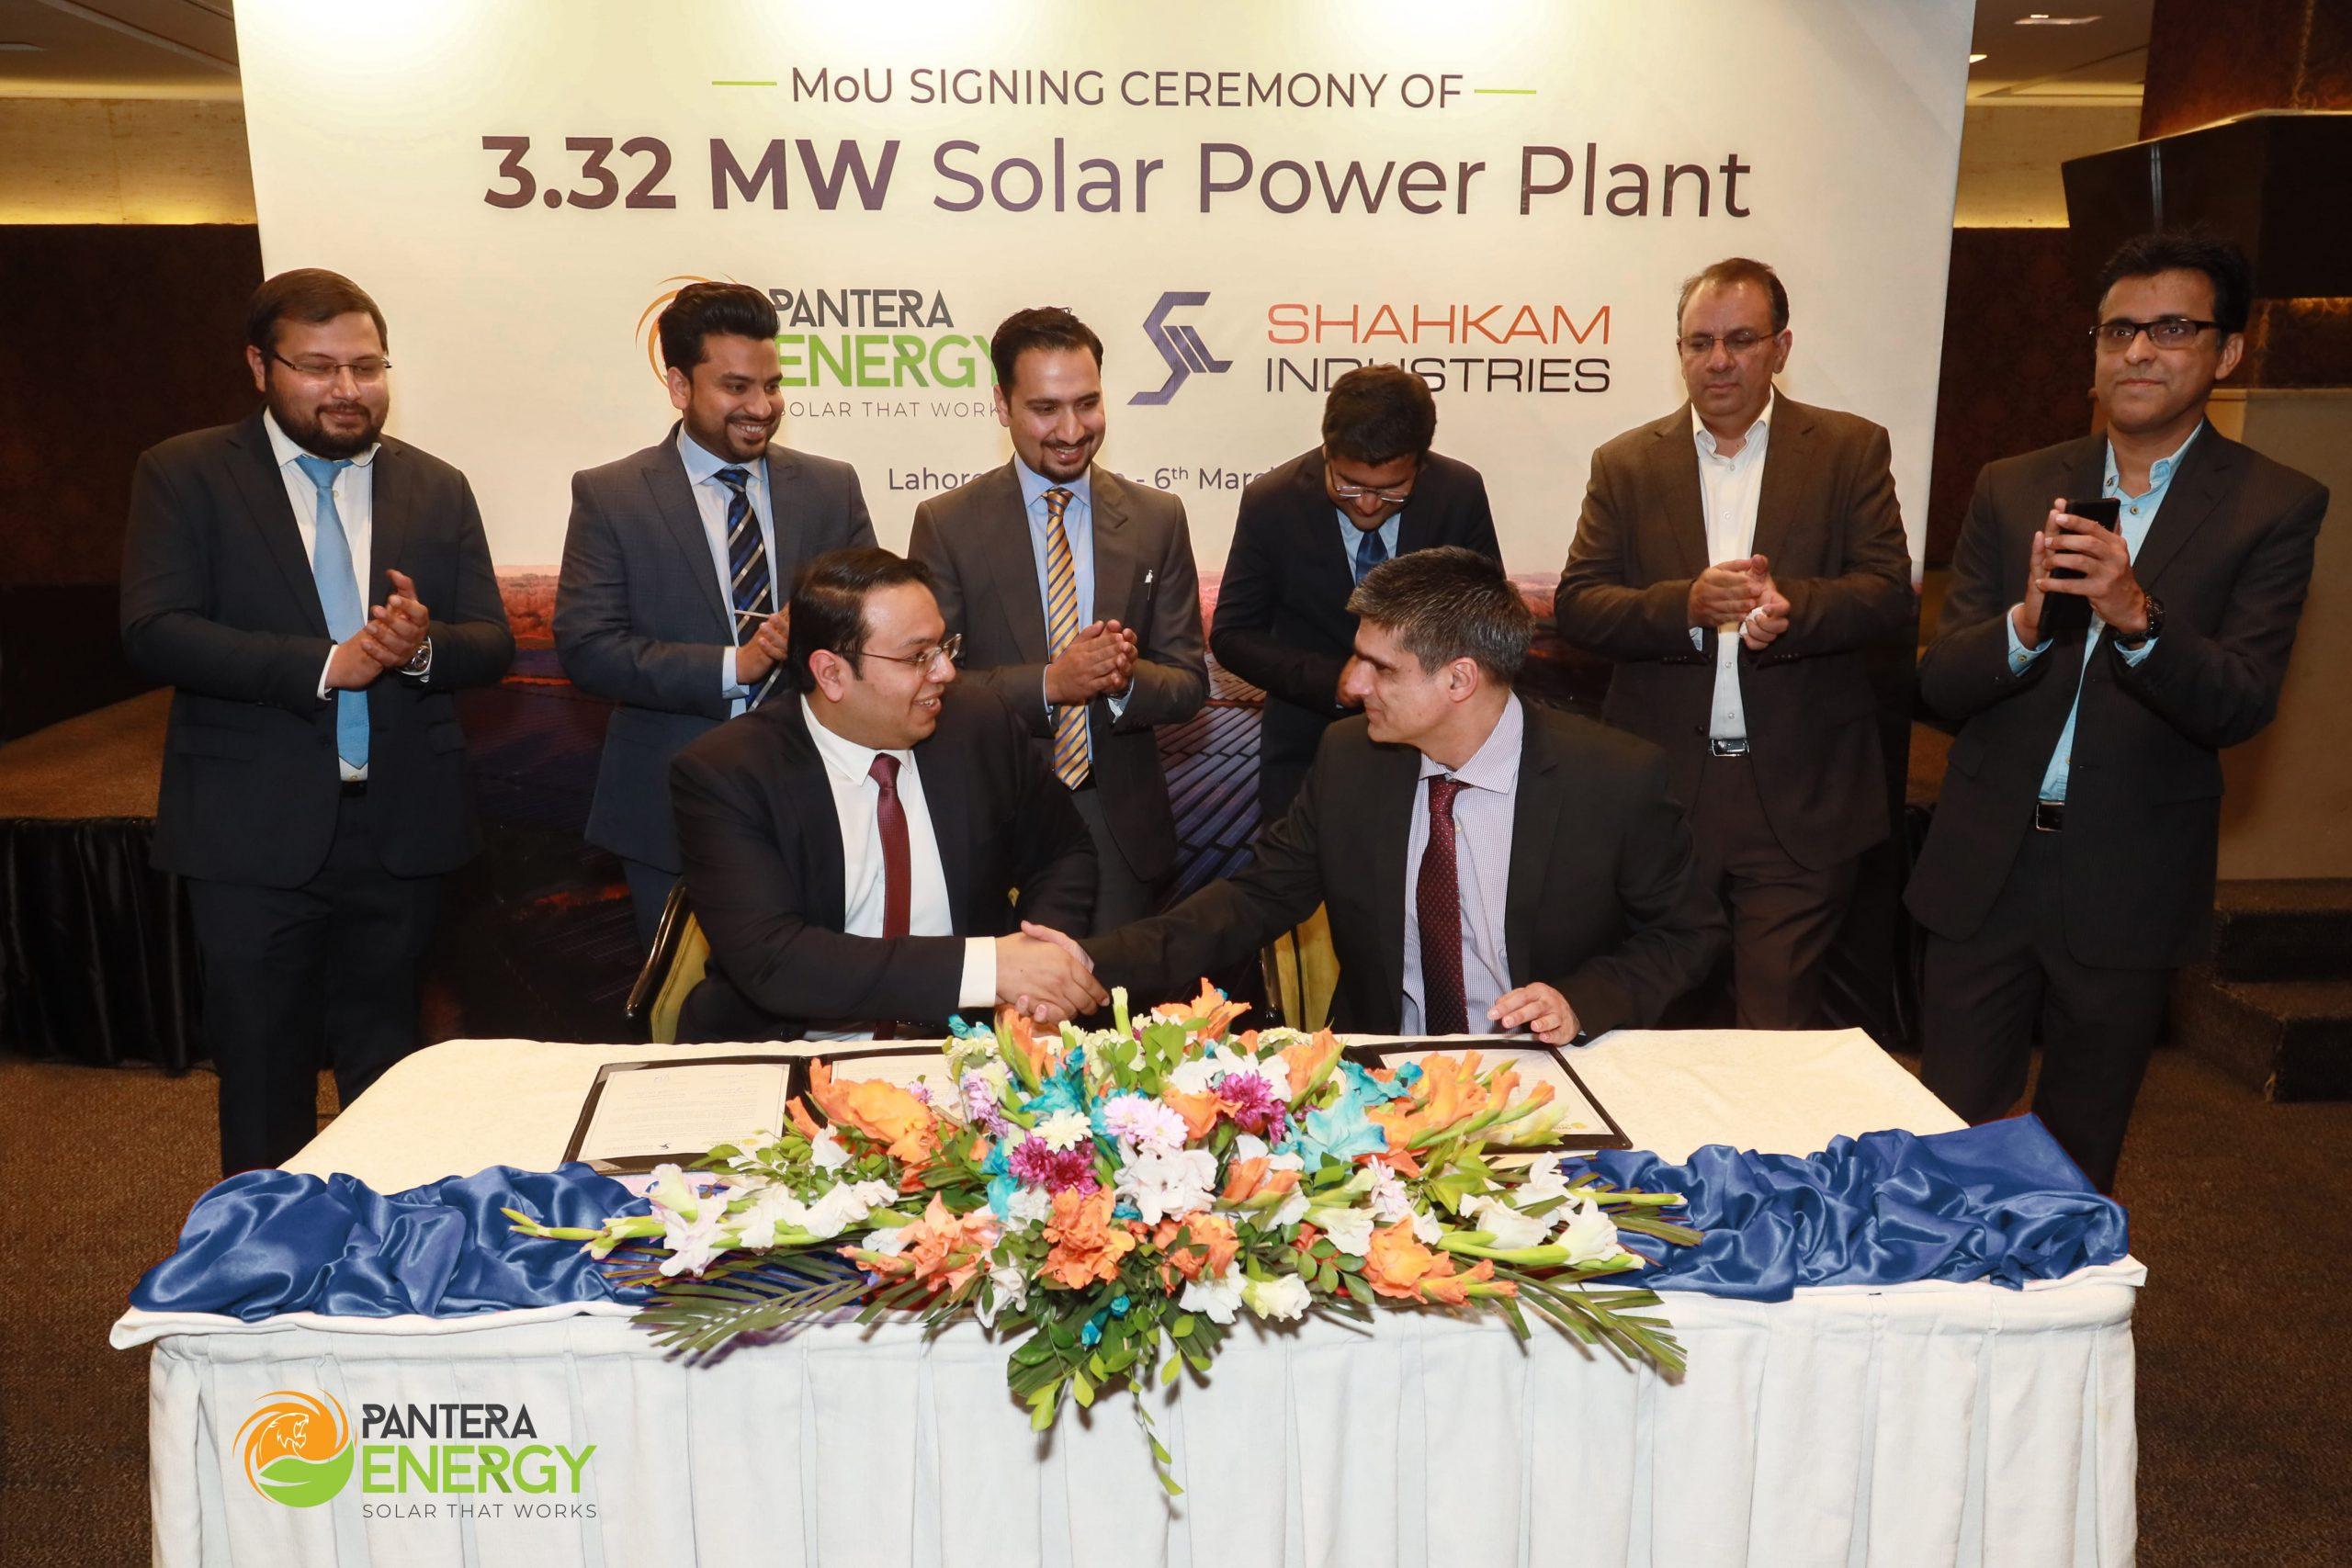 Shahkam-Pantera-Energy-techjuice